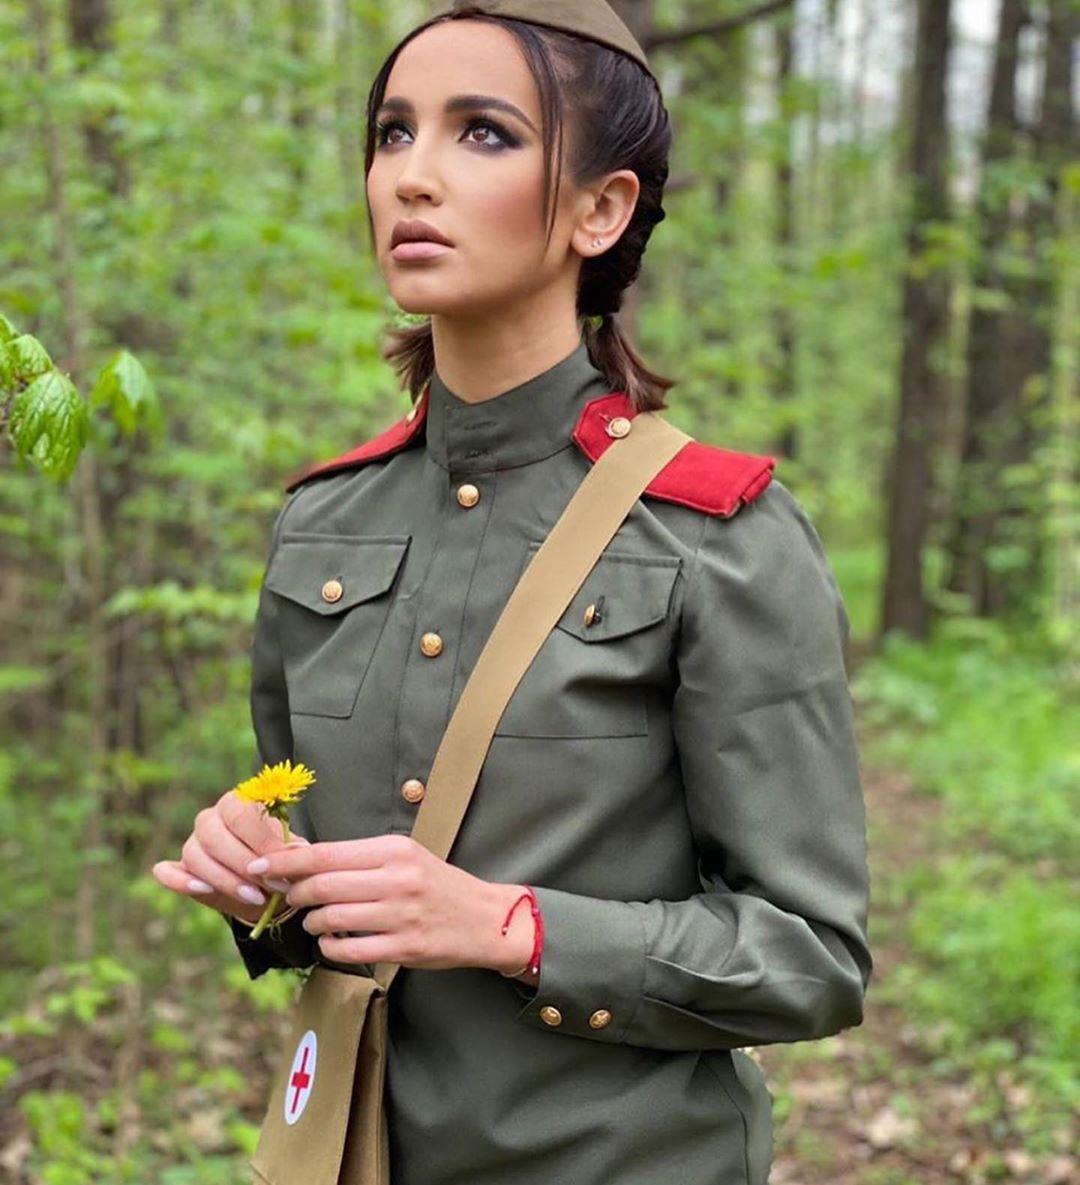 Ольга Бузова ради яркого фото отправилась в лес